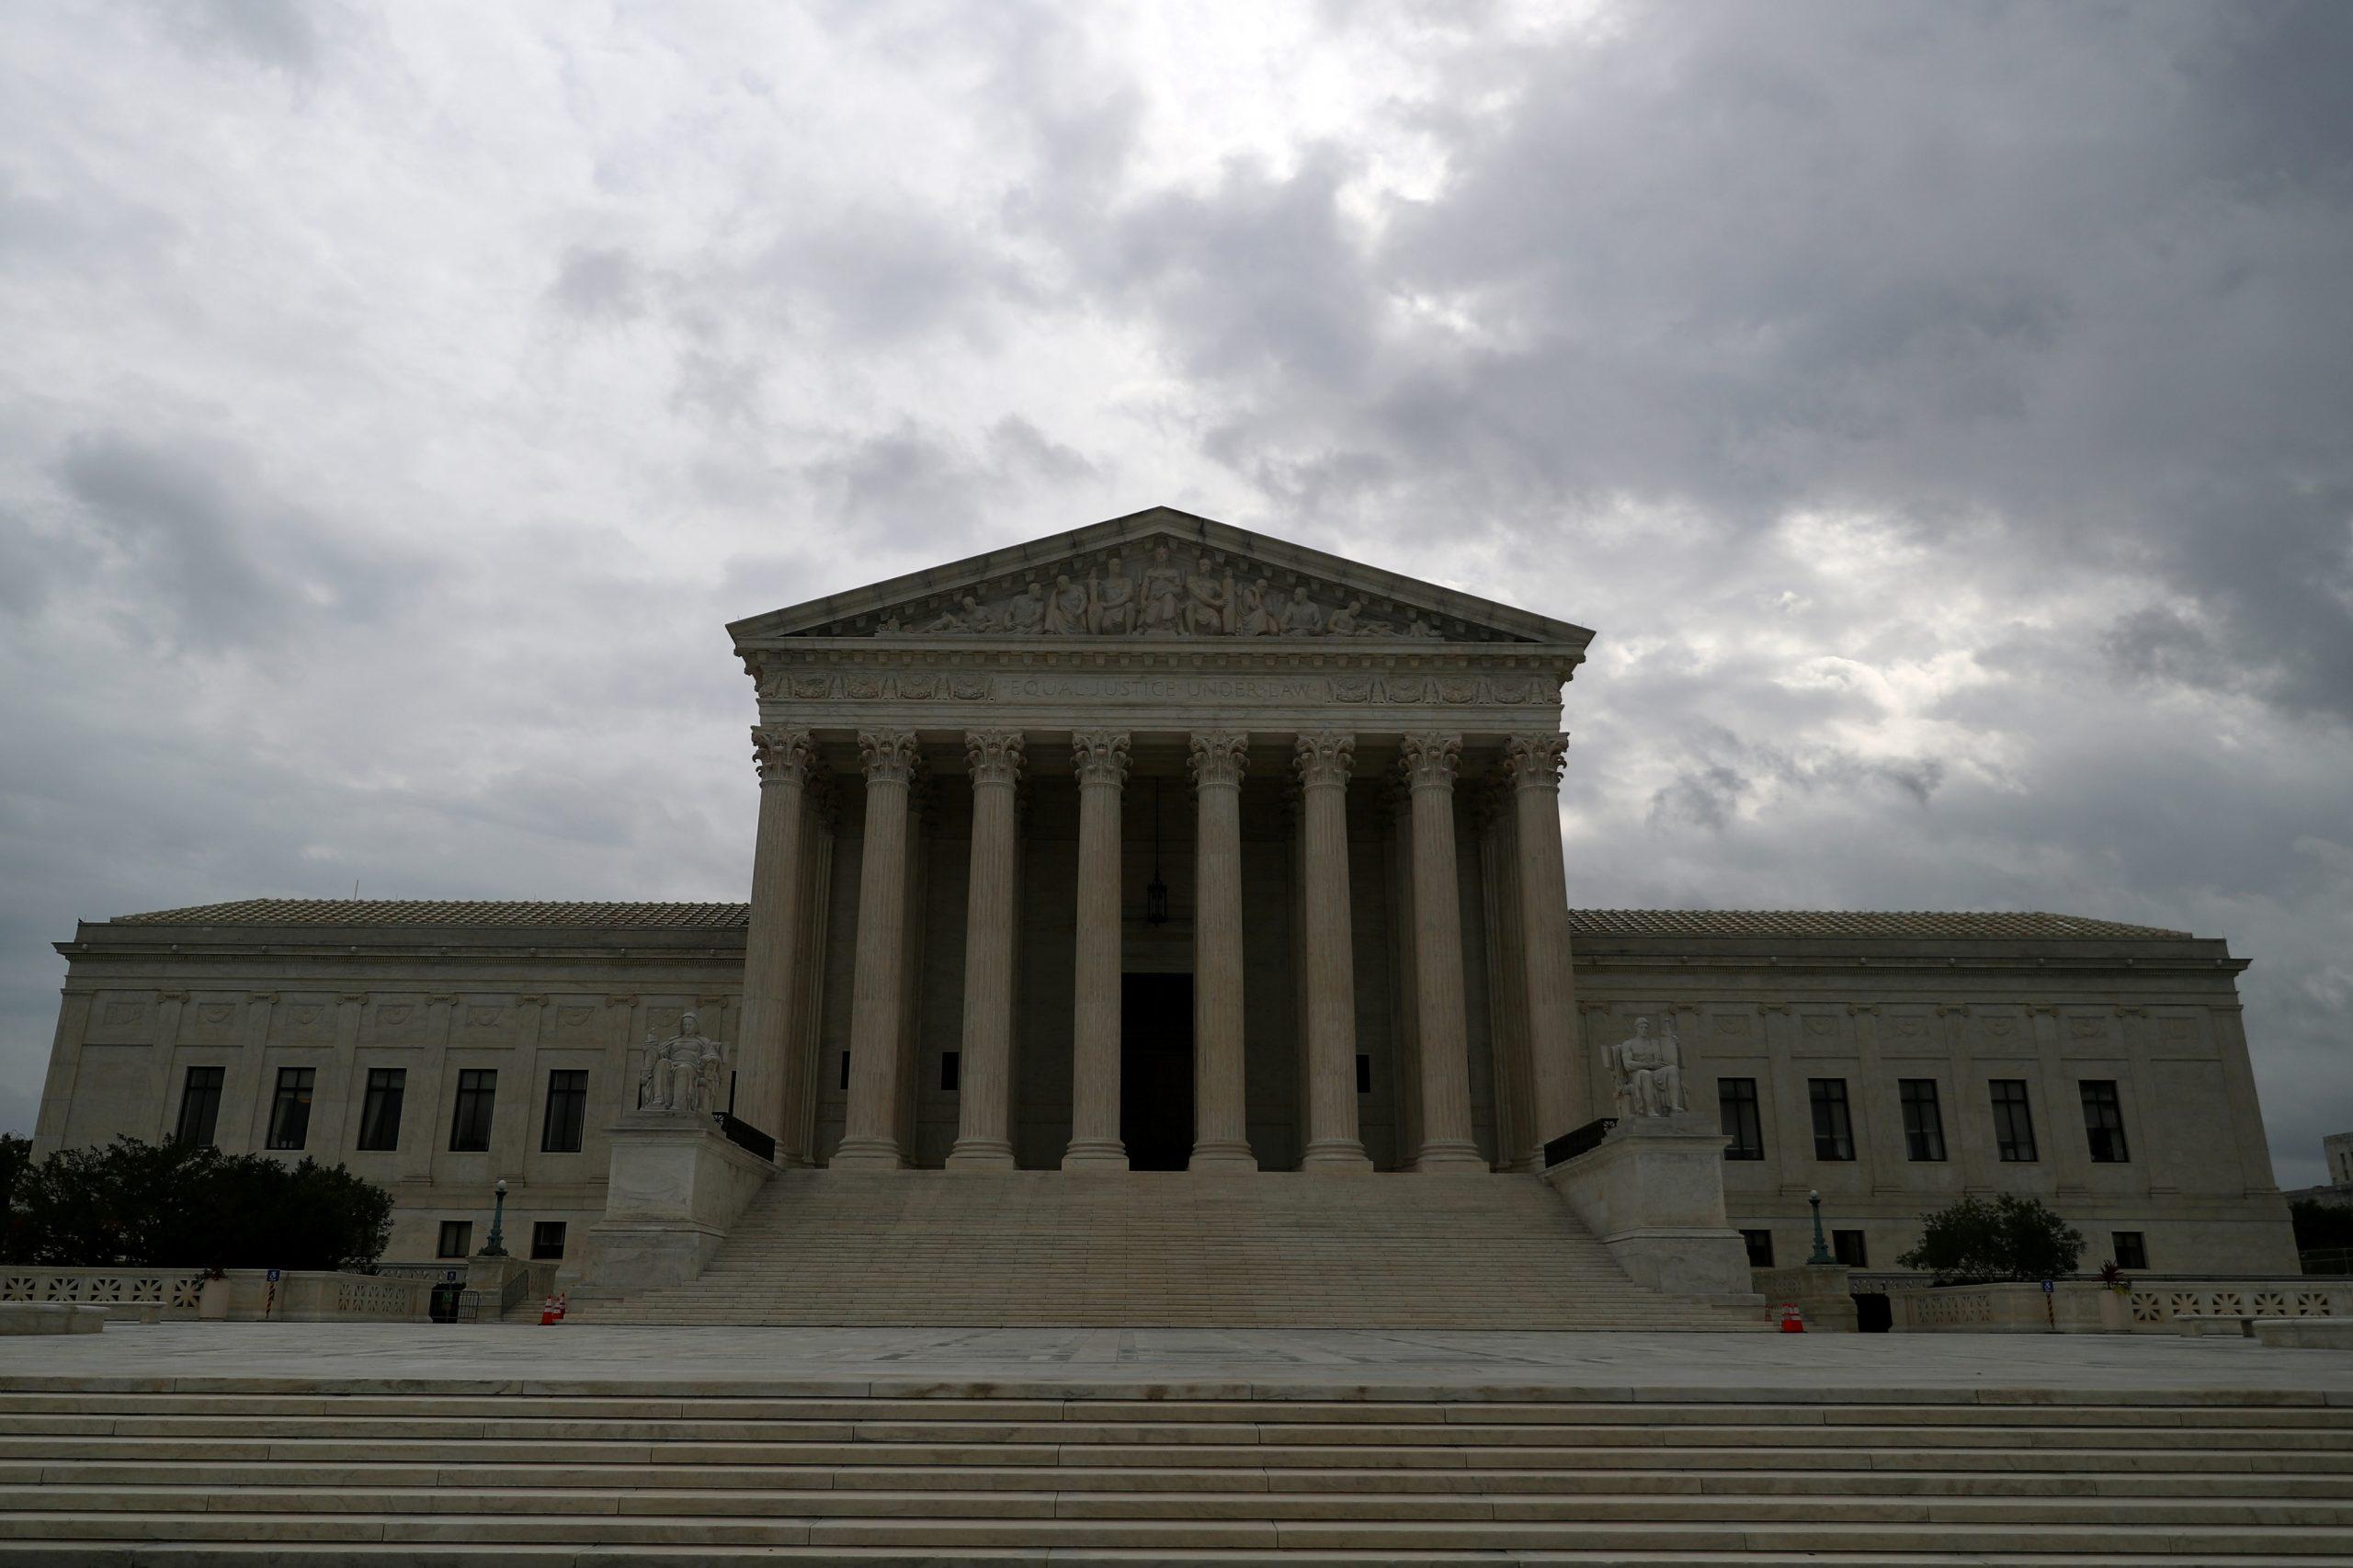 U.S. Supreme Court declines to block Texas abortion ban